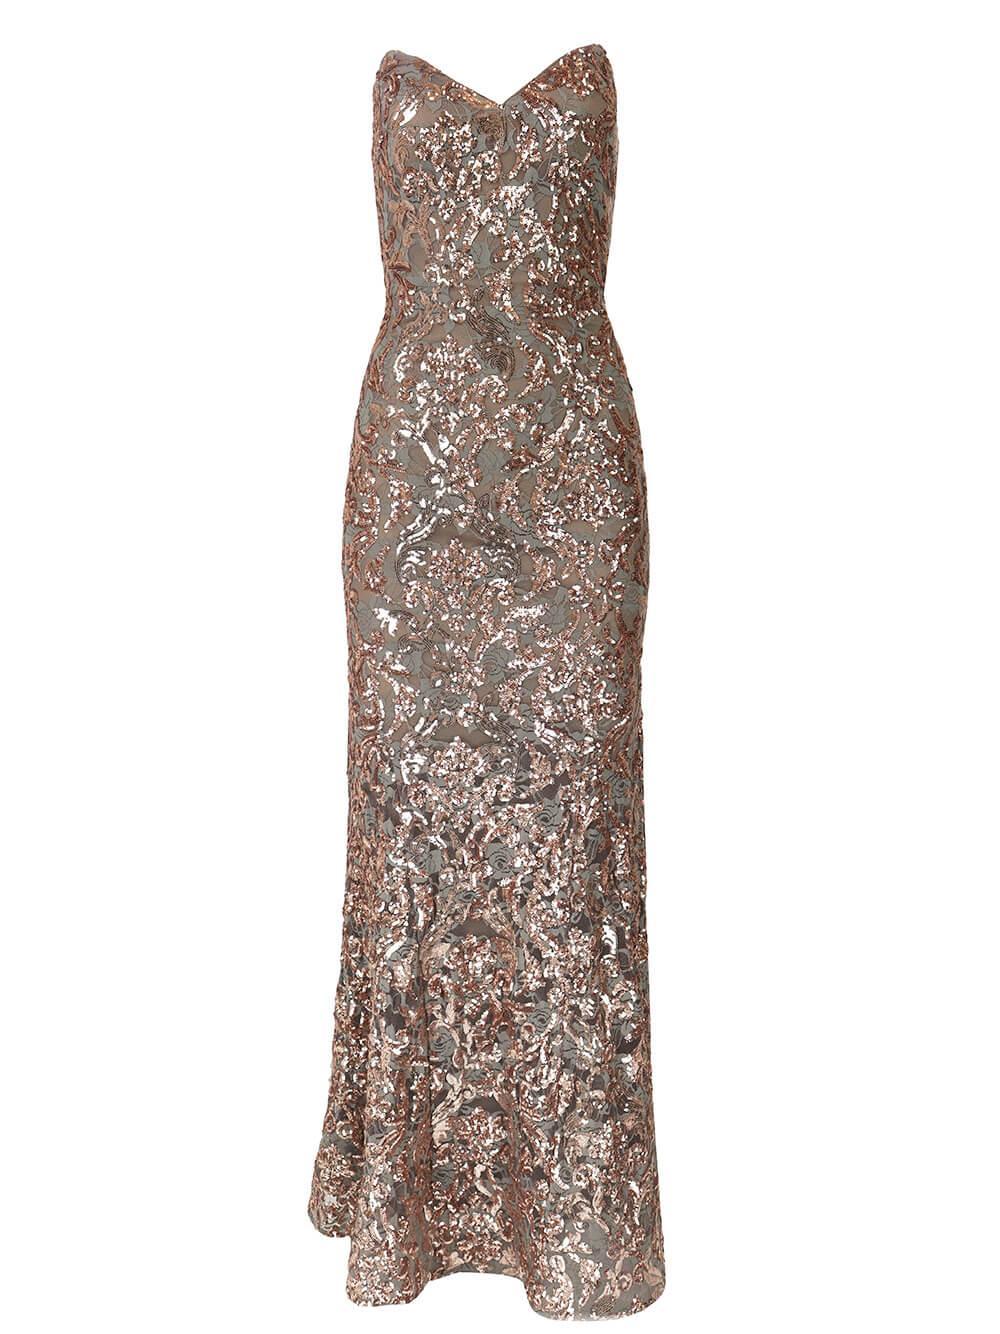 Sequin Evening Gown Item # 05054